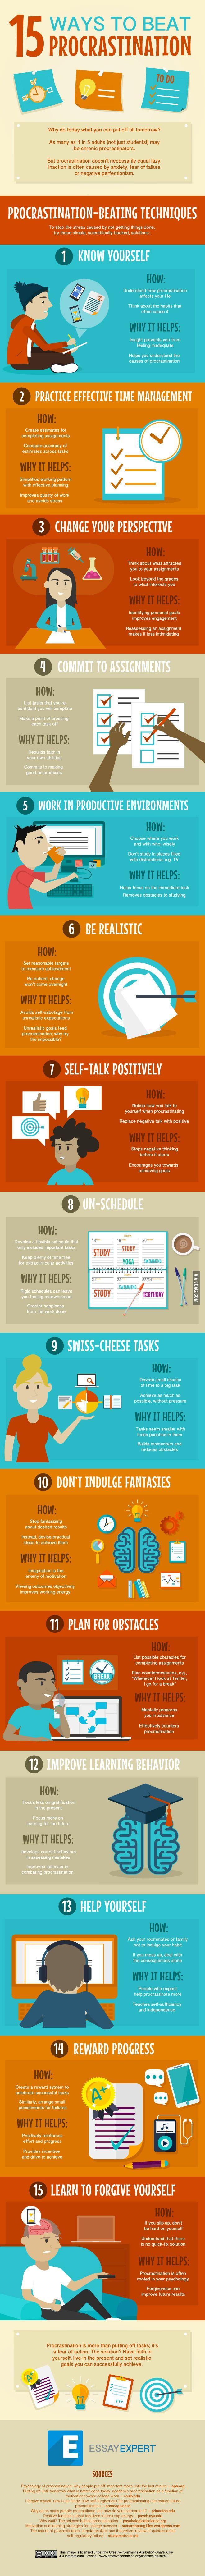 15 Ways to Overcome Procrastination